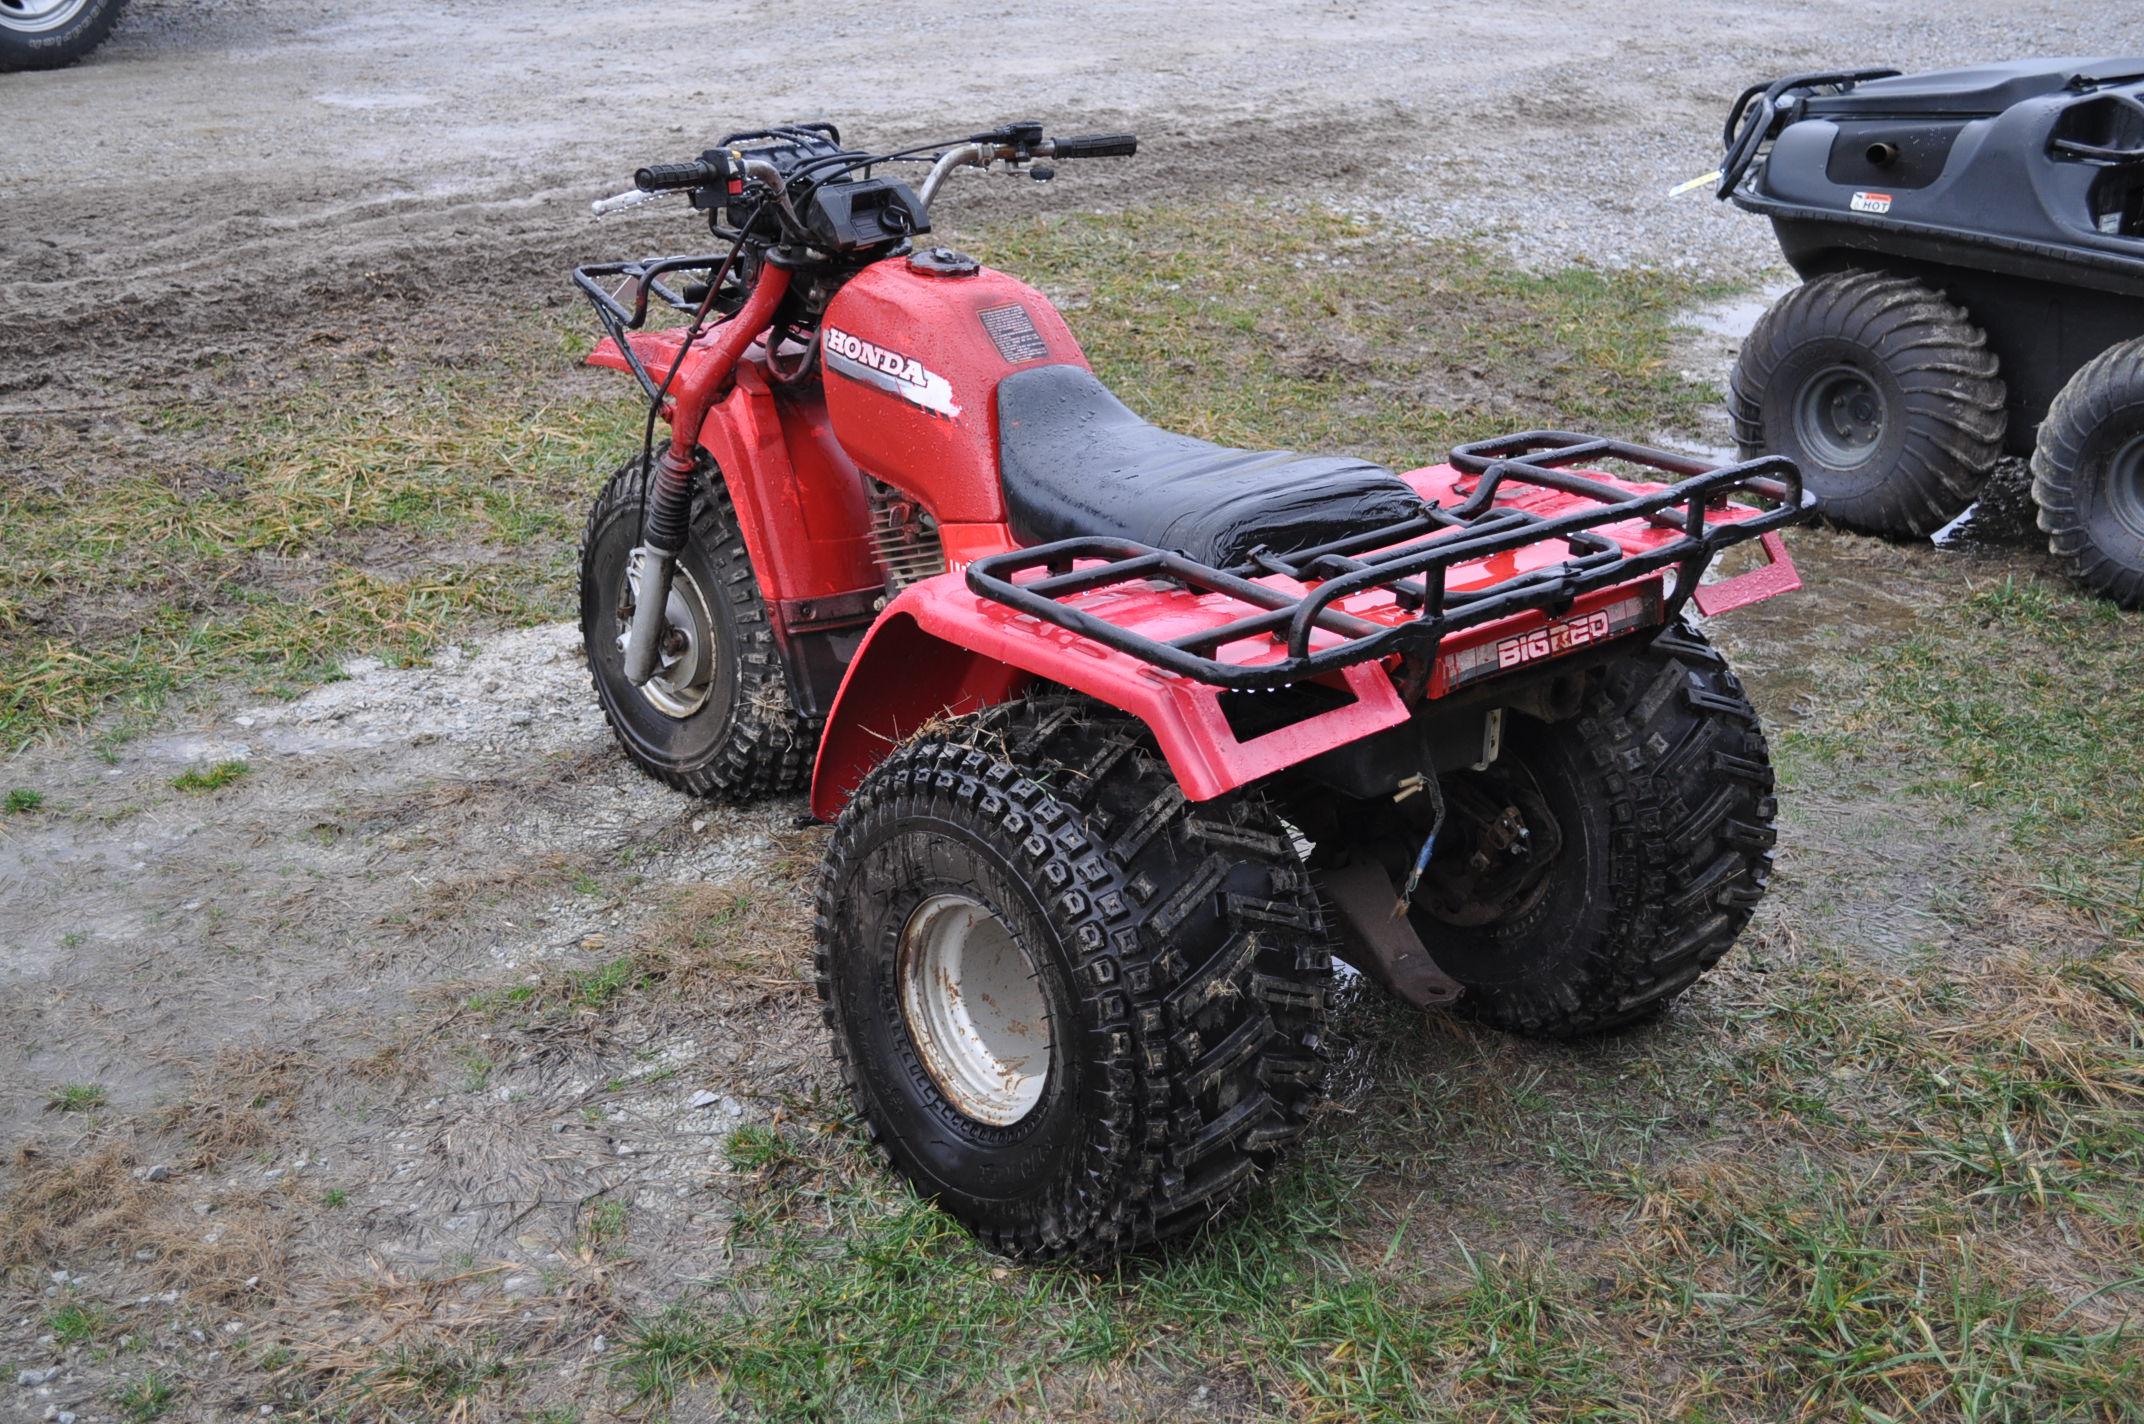 Honda Big Red 3-wheeler, new 25 x 12.00-9 tires - Image 2 of 8